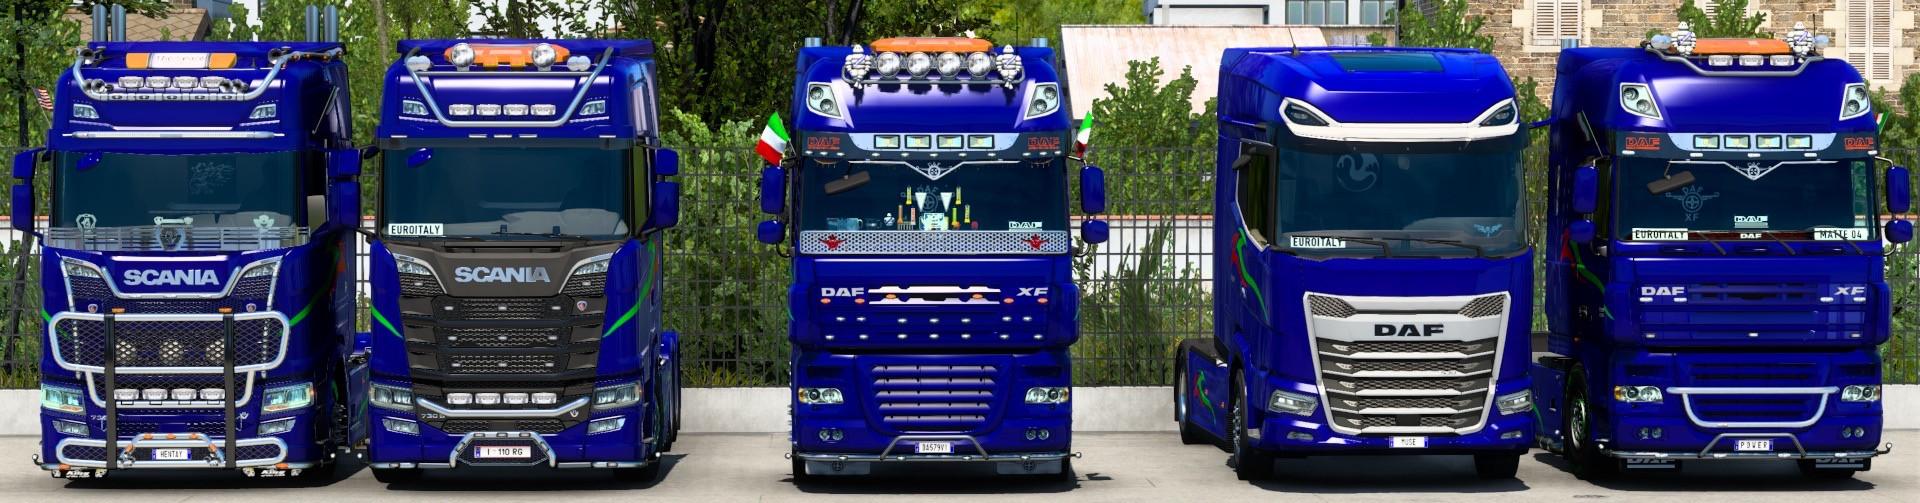 "EuroItaly Transports | ""A spasso per l'Europa #4"""